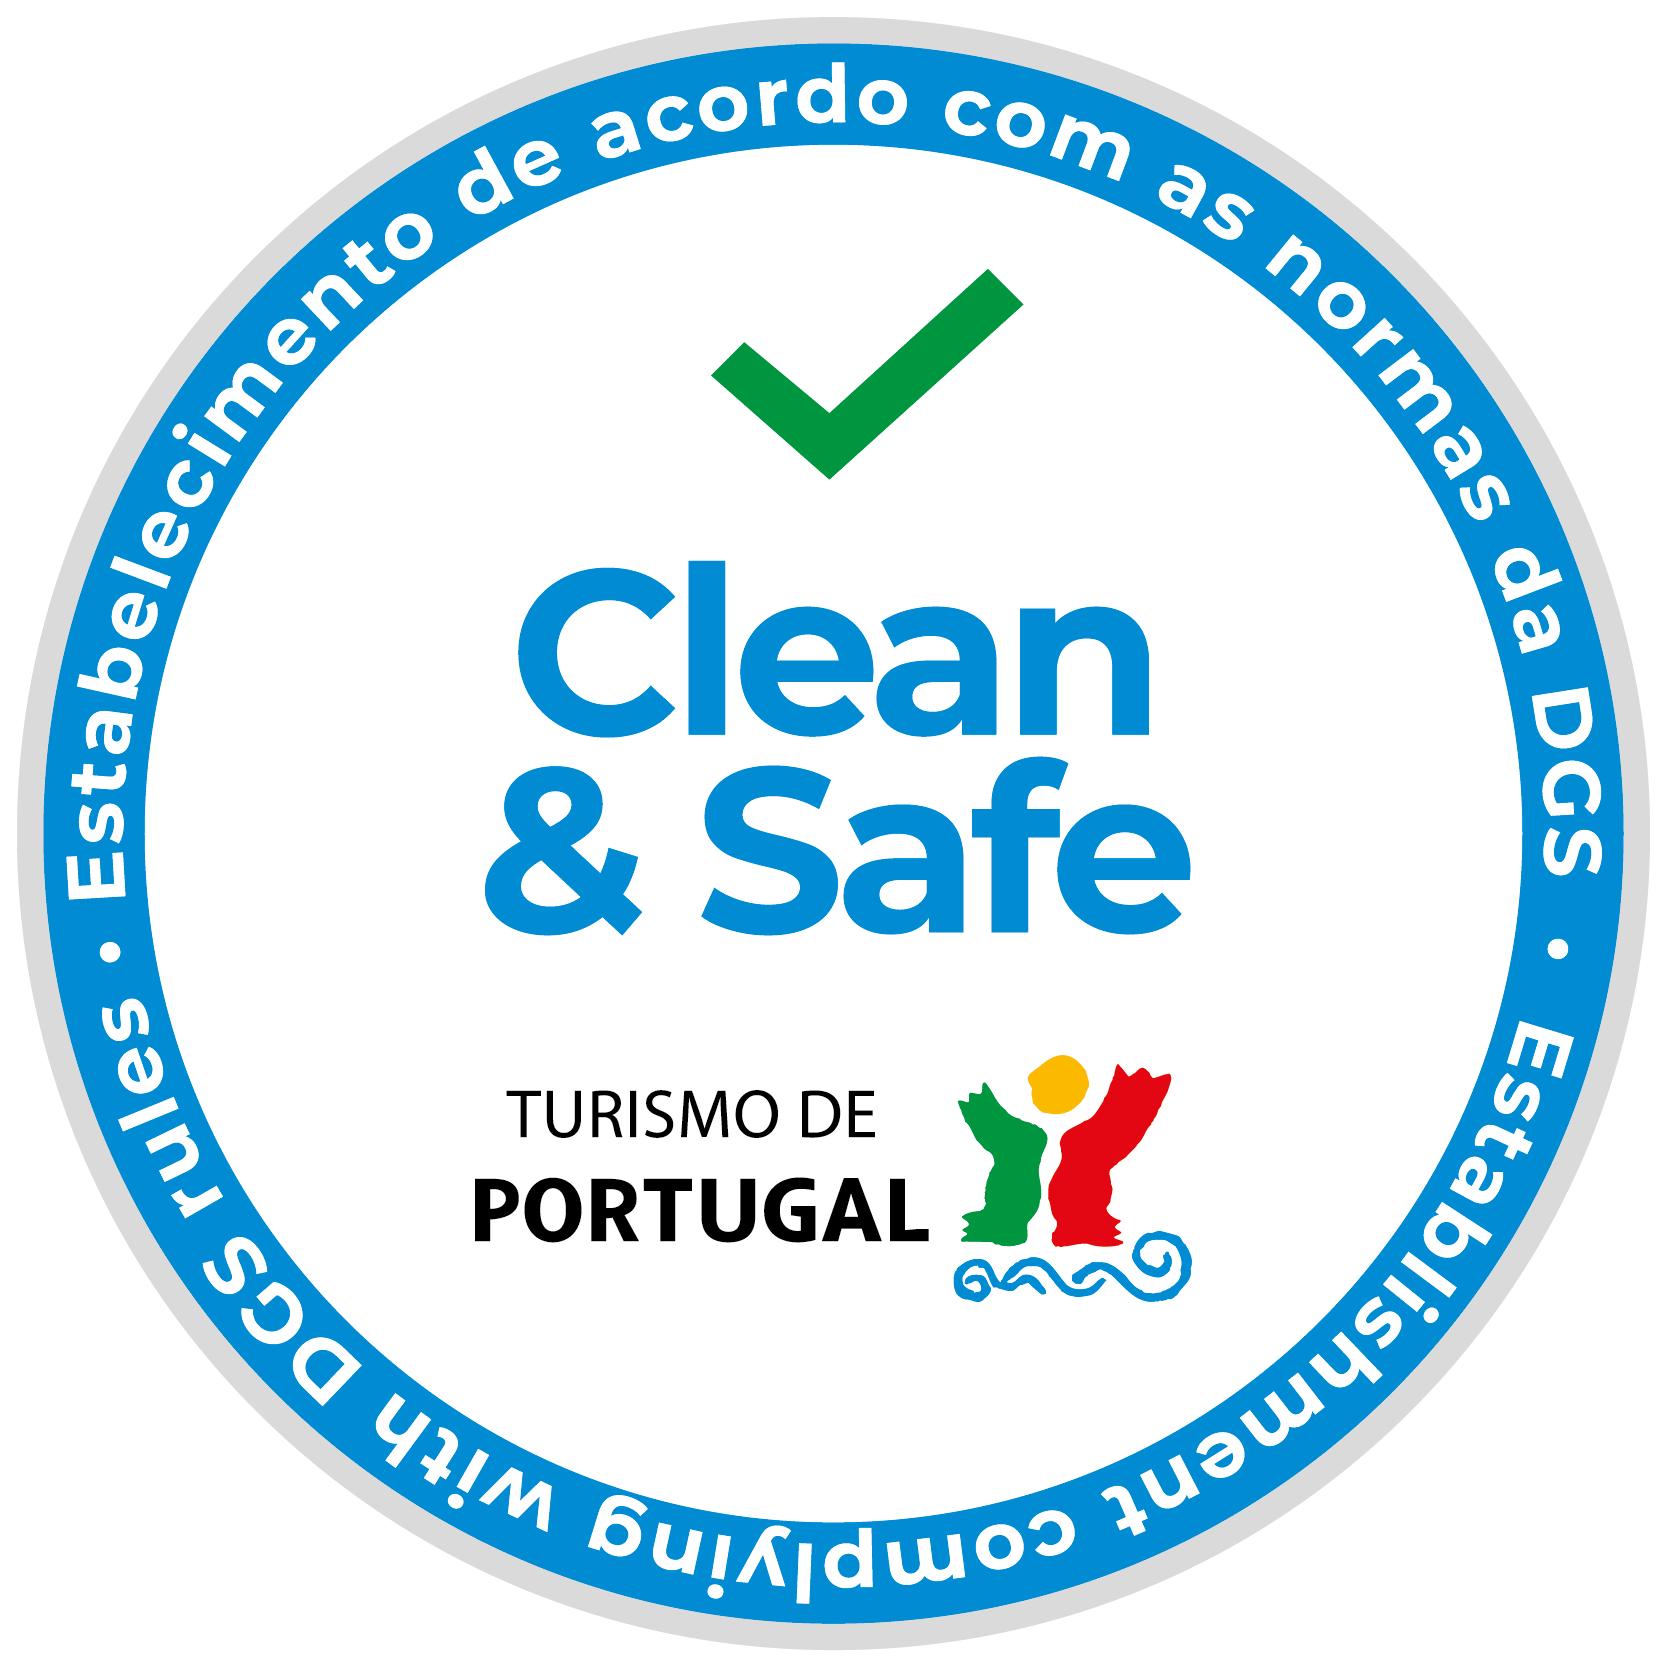 TDP_Alojamento&Saúde_Logos-07